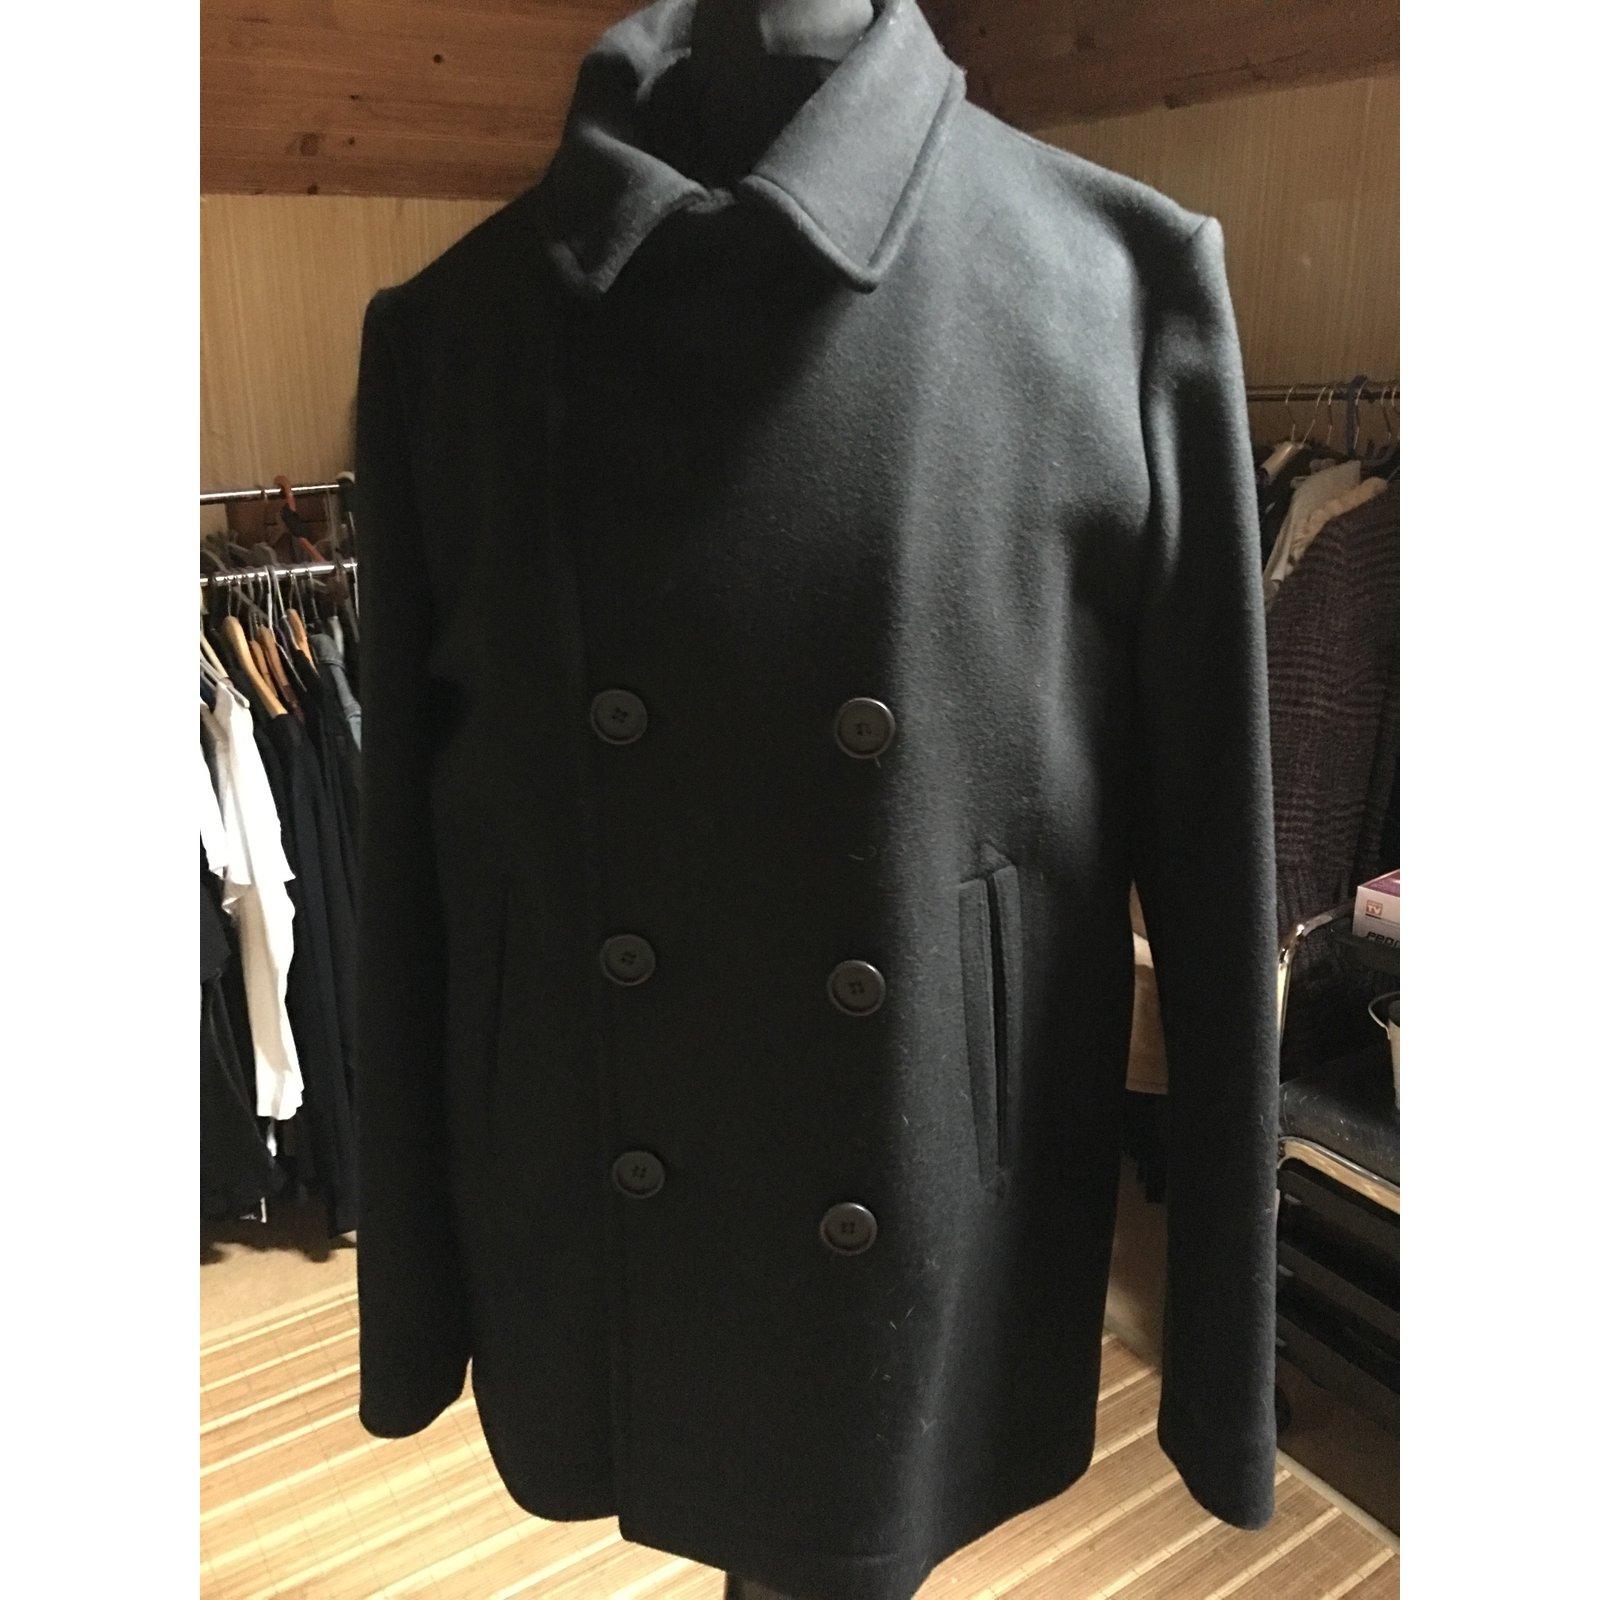 4831ec43dca1 Lacoste Coat Men Coats Outerwear Wool Black ref.31069 - Joli Closet